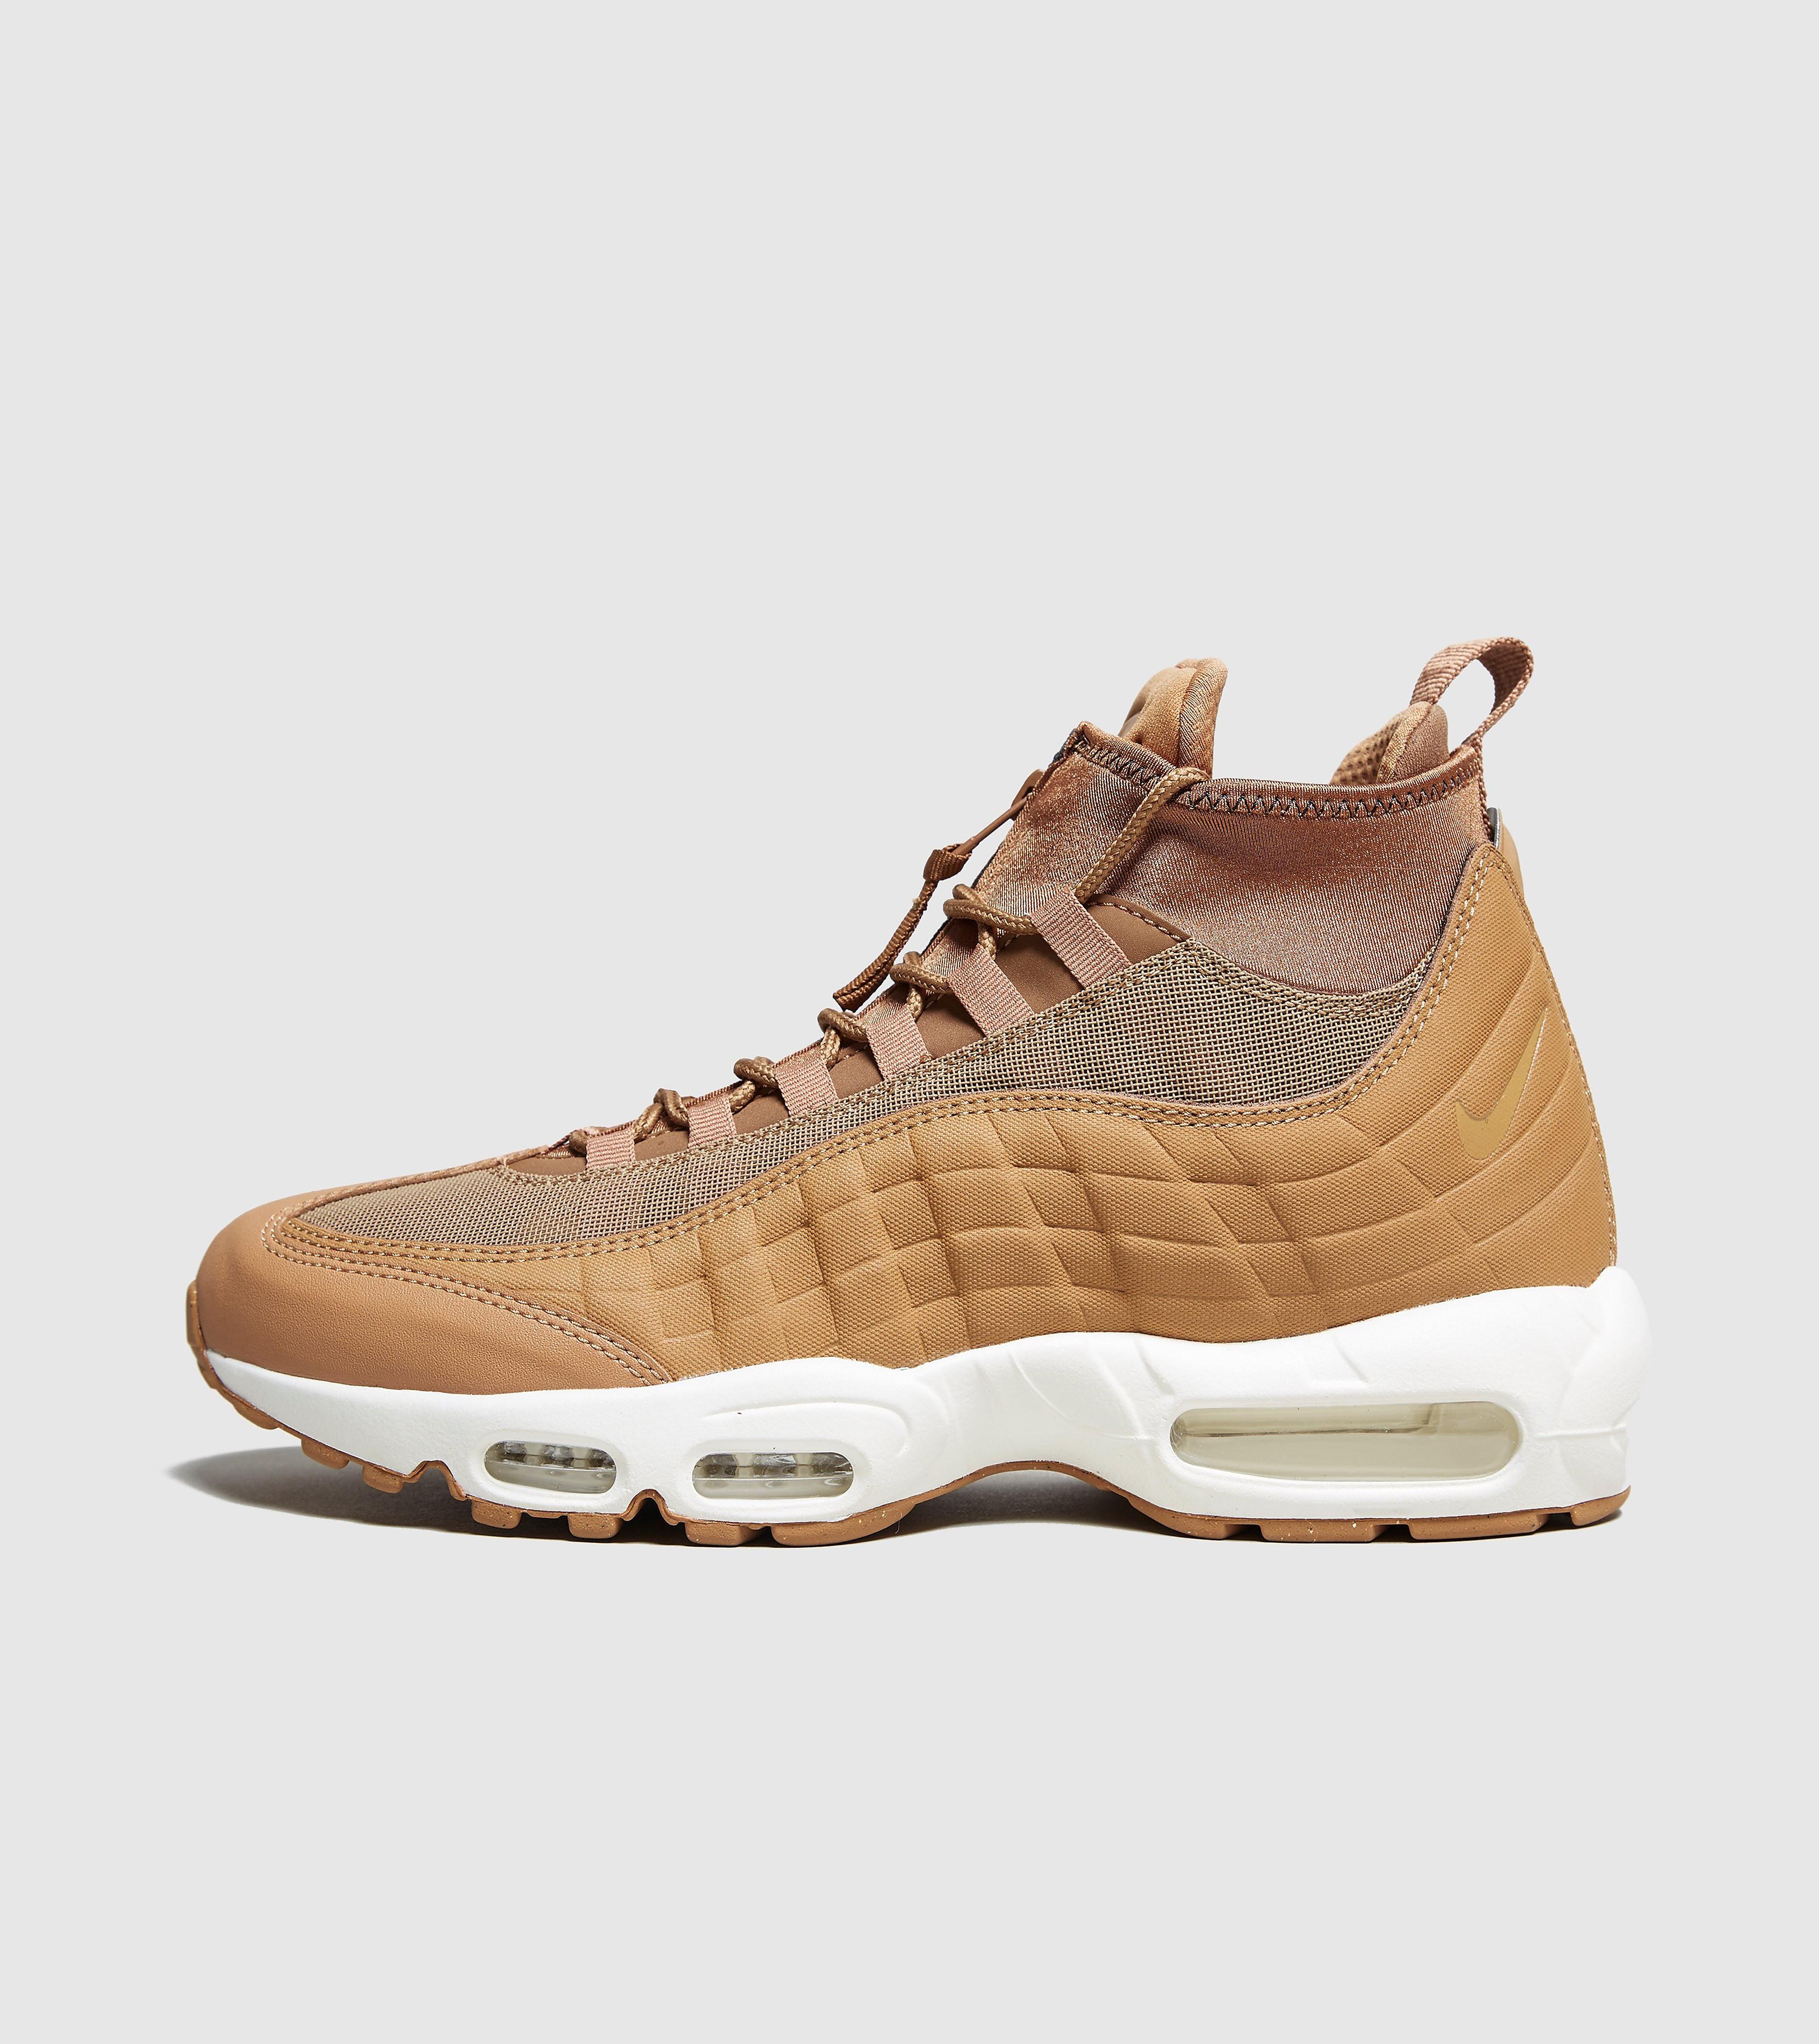 Nike Air Max 95 Sneakerboot Flax